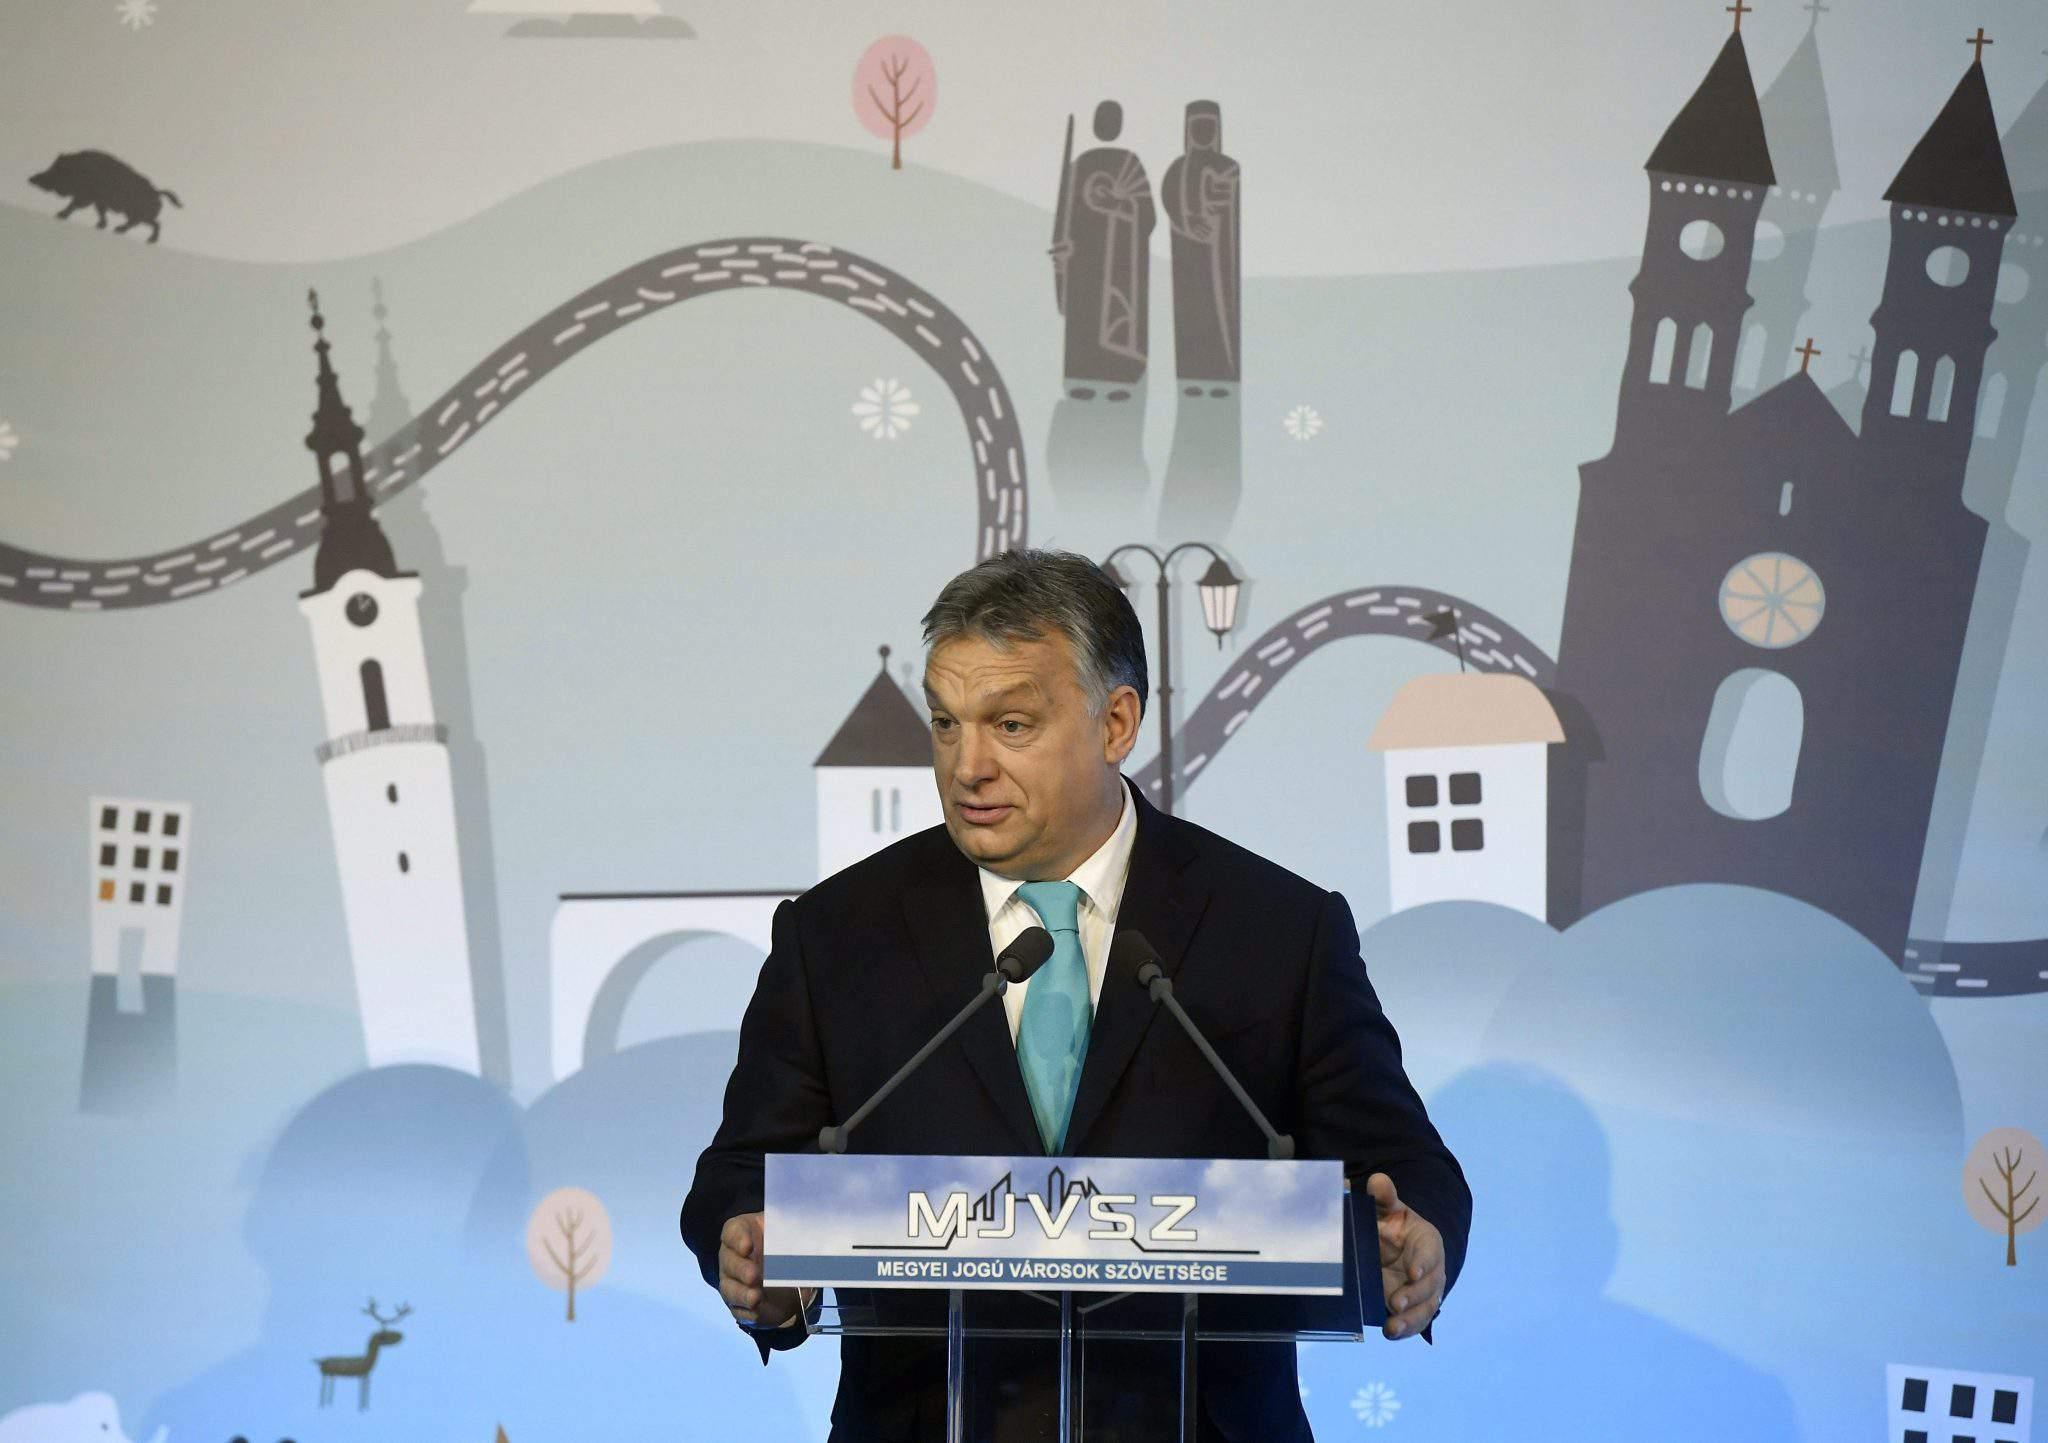 viktor orbán talk Veszprém prime minister